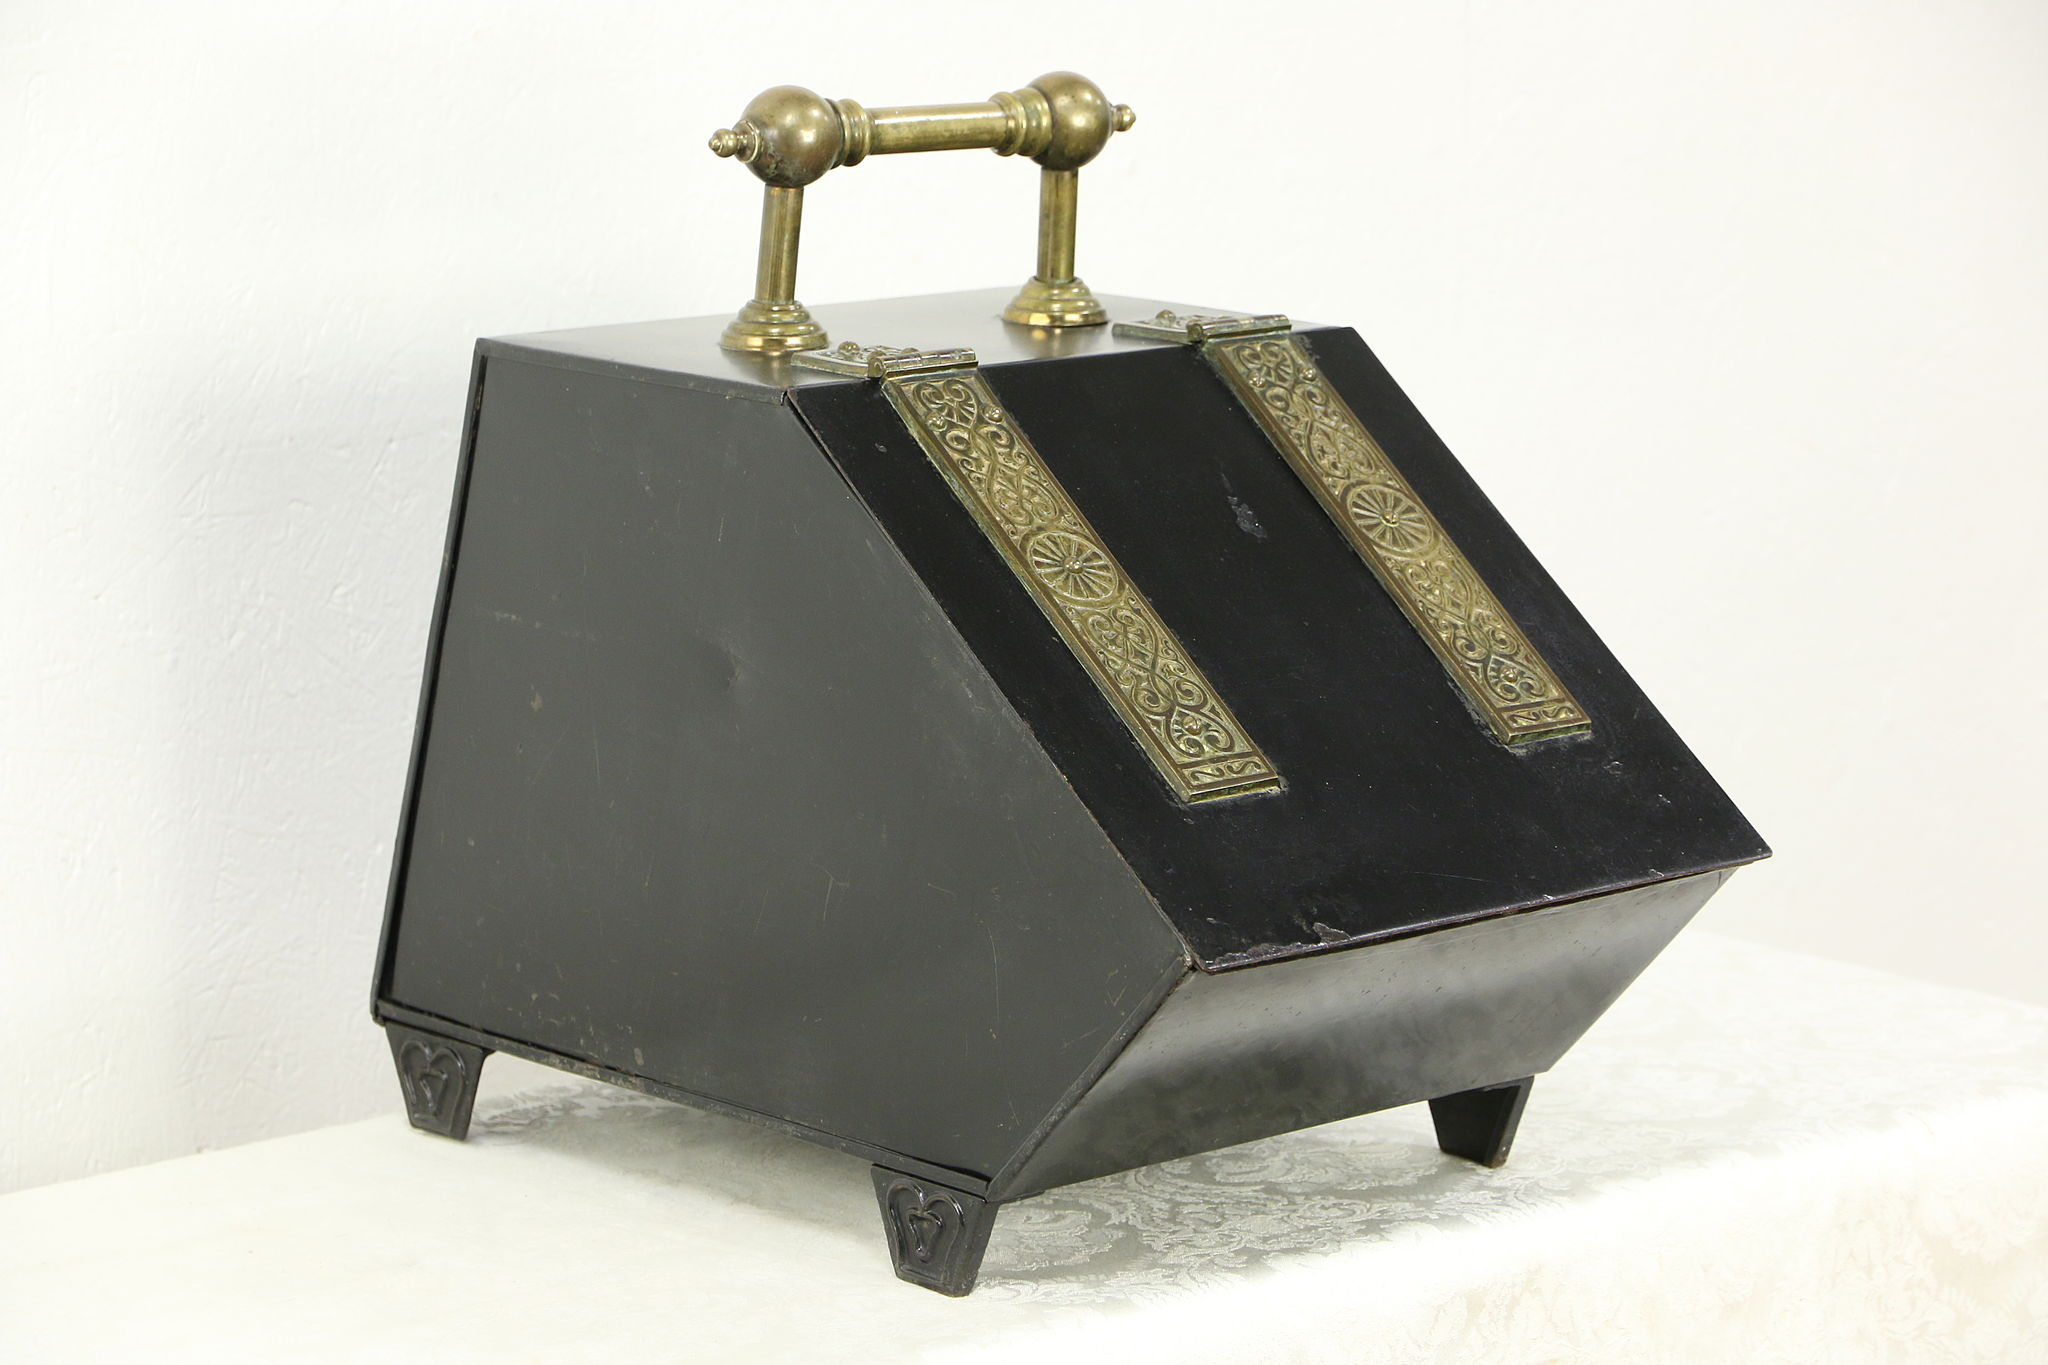 Victorian 1880 Antique Iron U0026 Brass Fireplace Coal Hod Or Caddy, ...